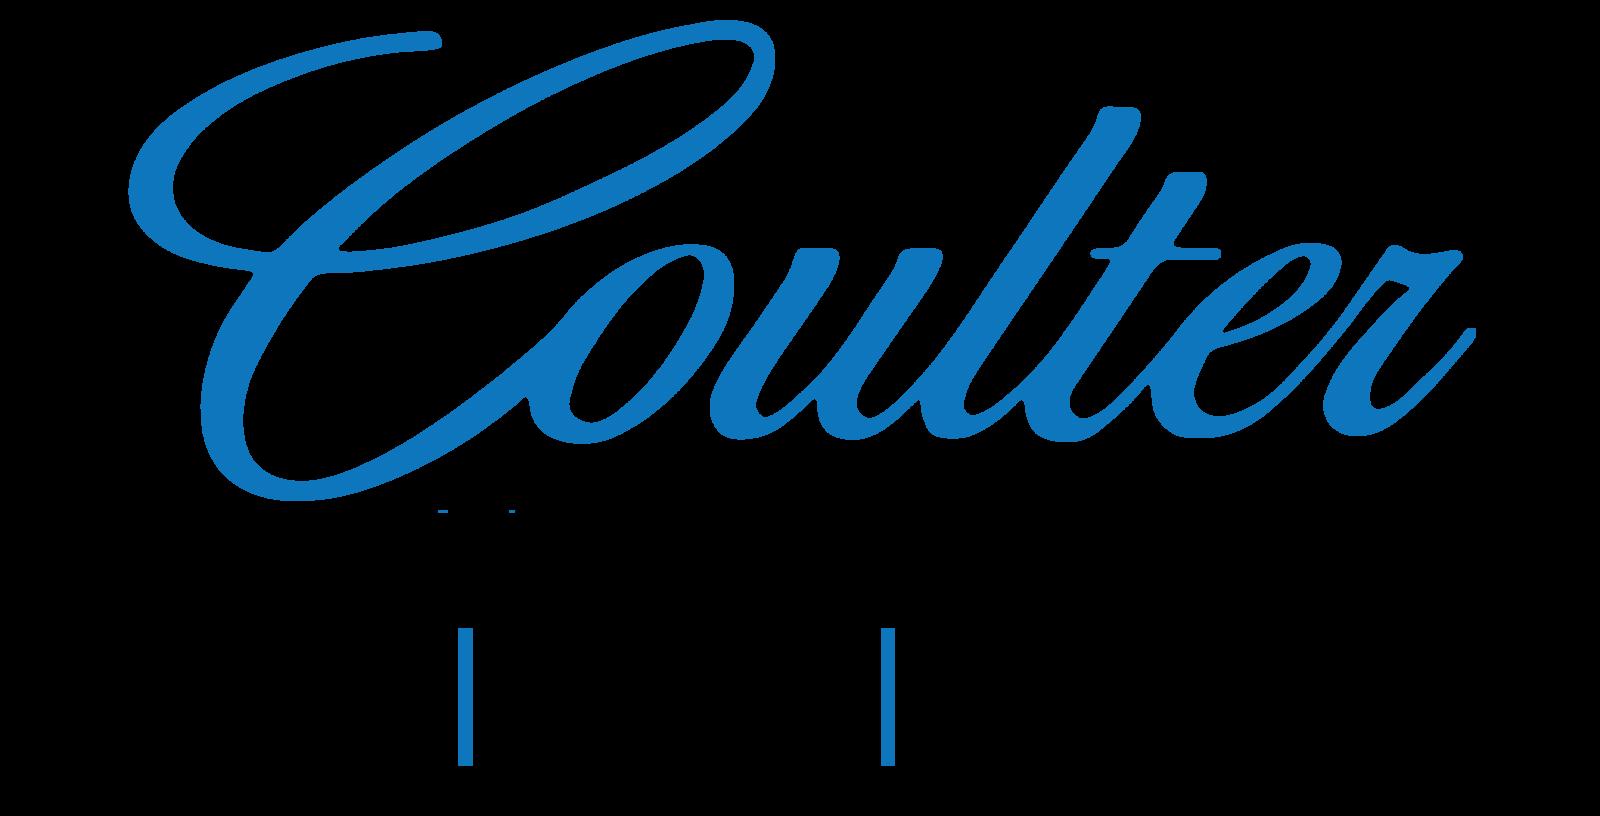 Coulter Cadillac Buick Gmc Phoenix Az Read Consumer